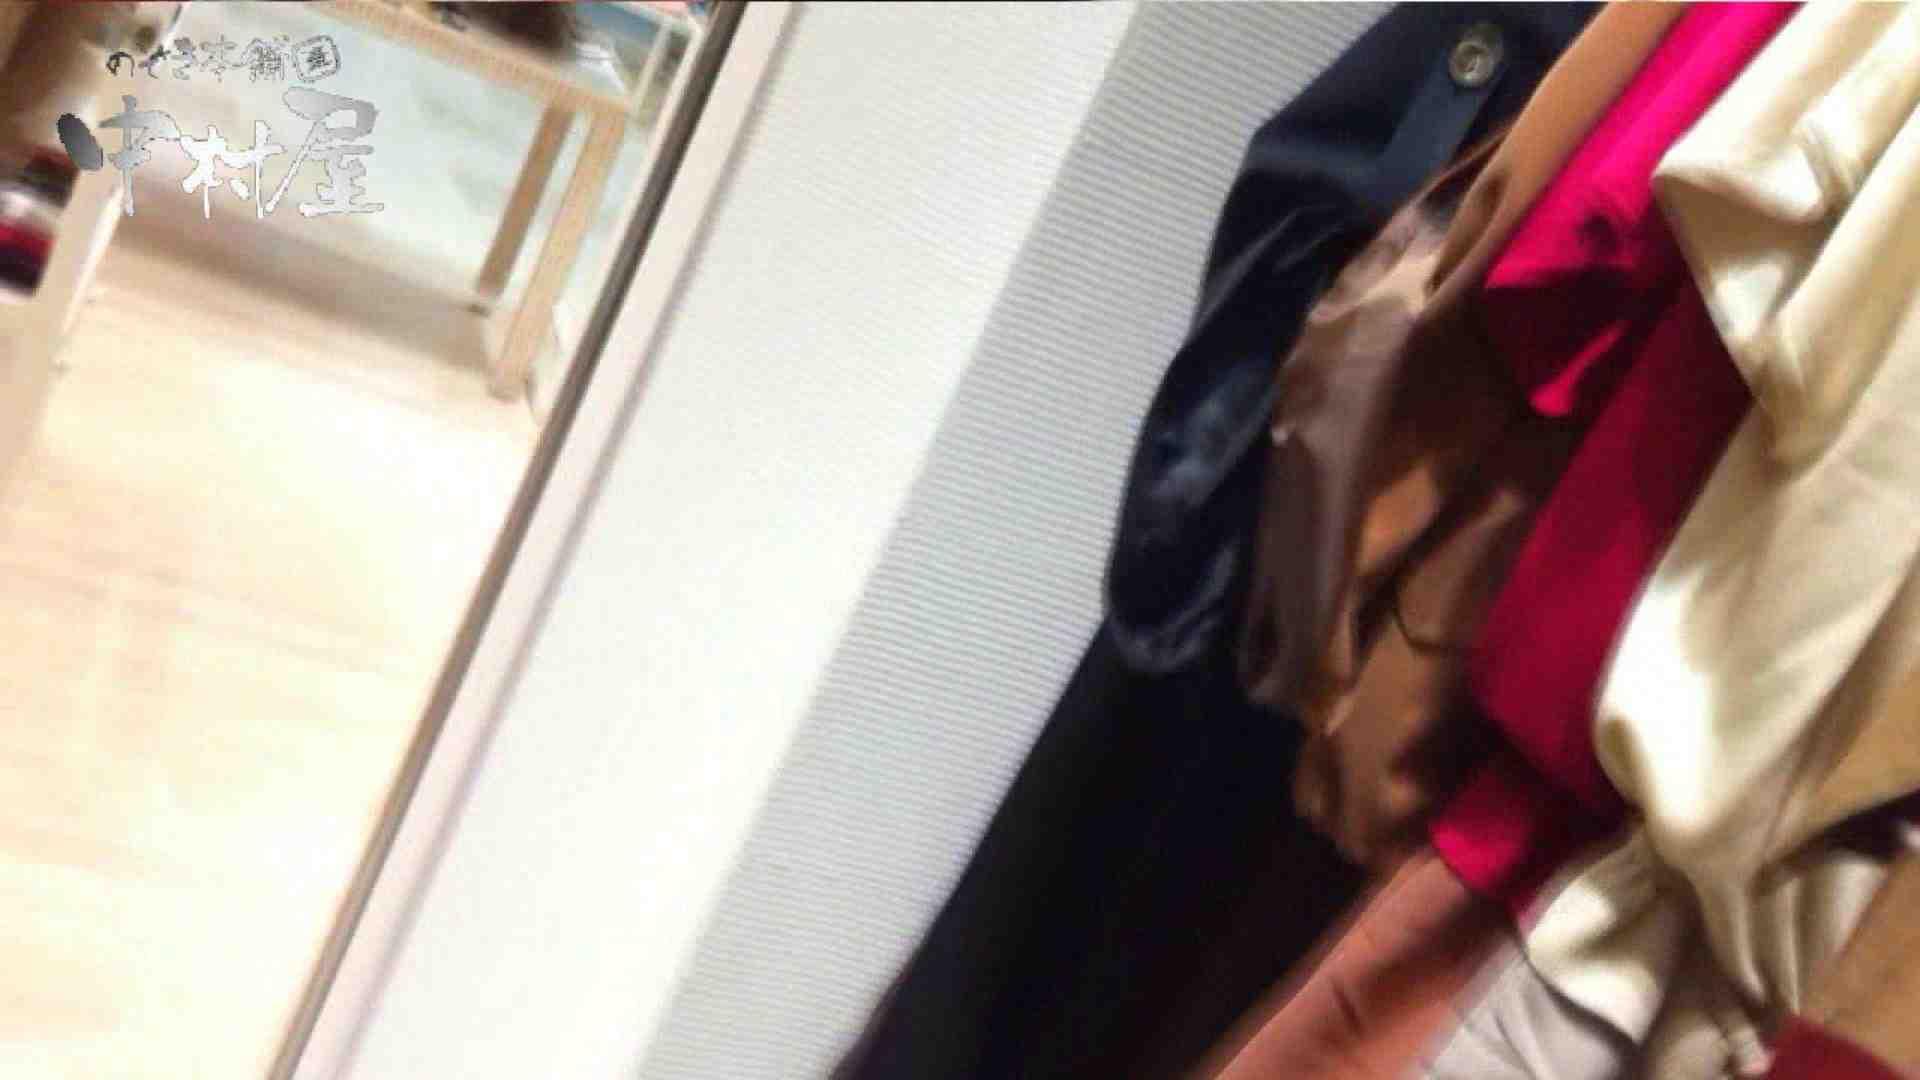 vol.52 美人アパレル胸チラ&パンチラ おとなしそうな店員の胸元にアタック! 接写 盗撮ワレメ無修正動画無料 86画像 68